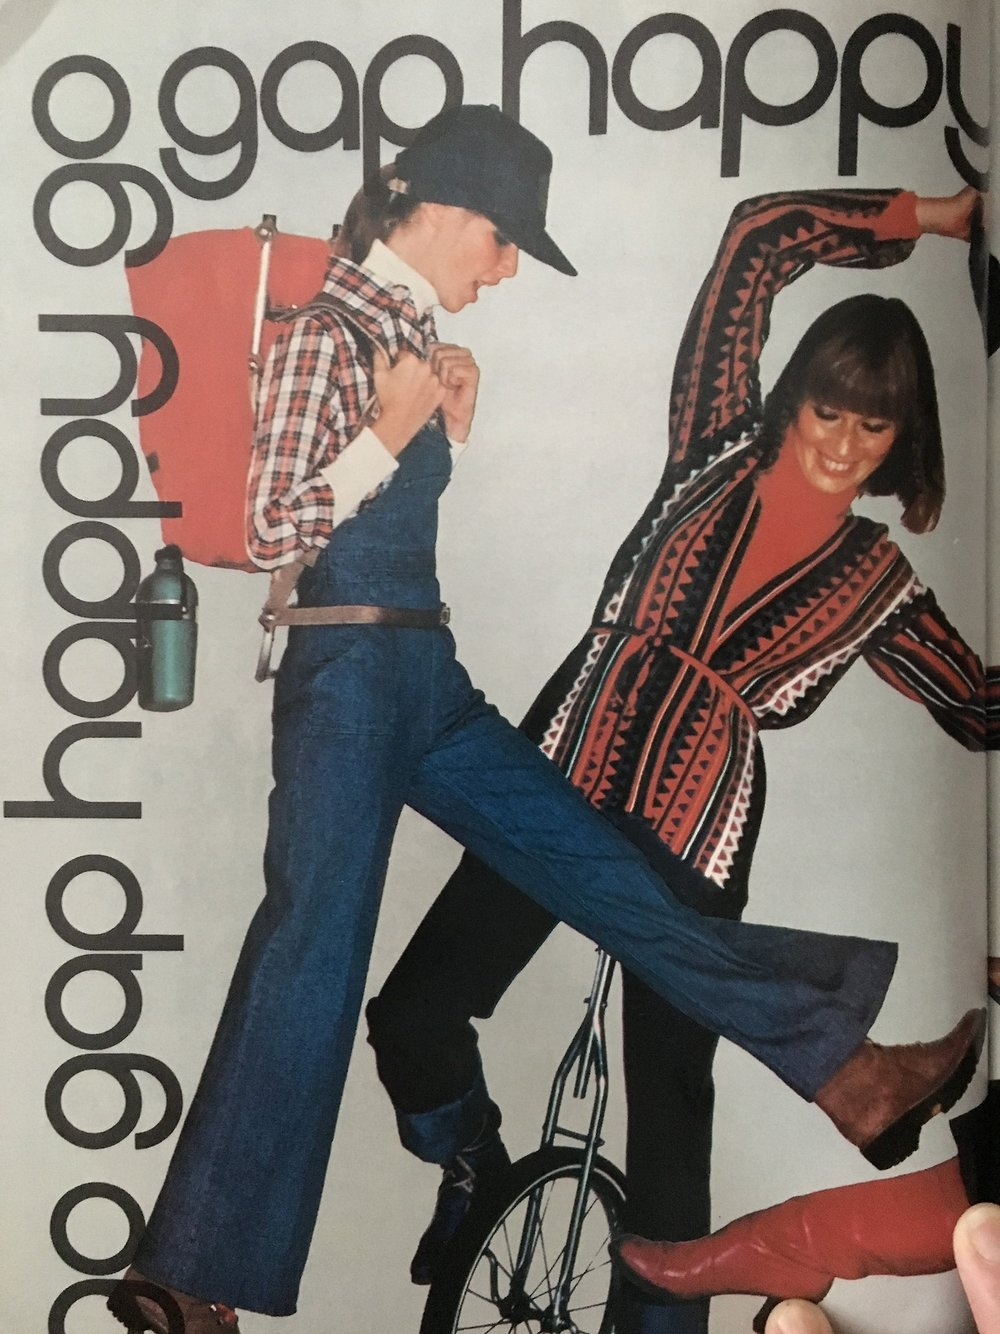 Go Gap Happy.   Mademoiselle. August. 1976.